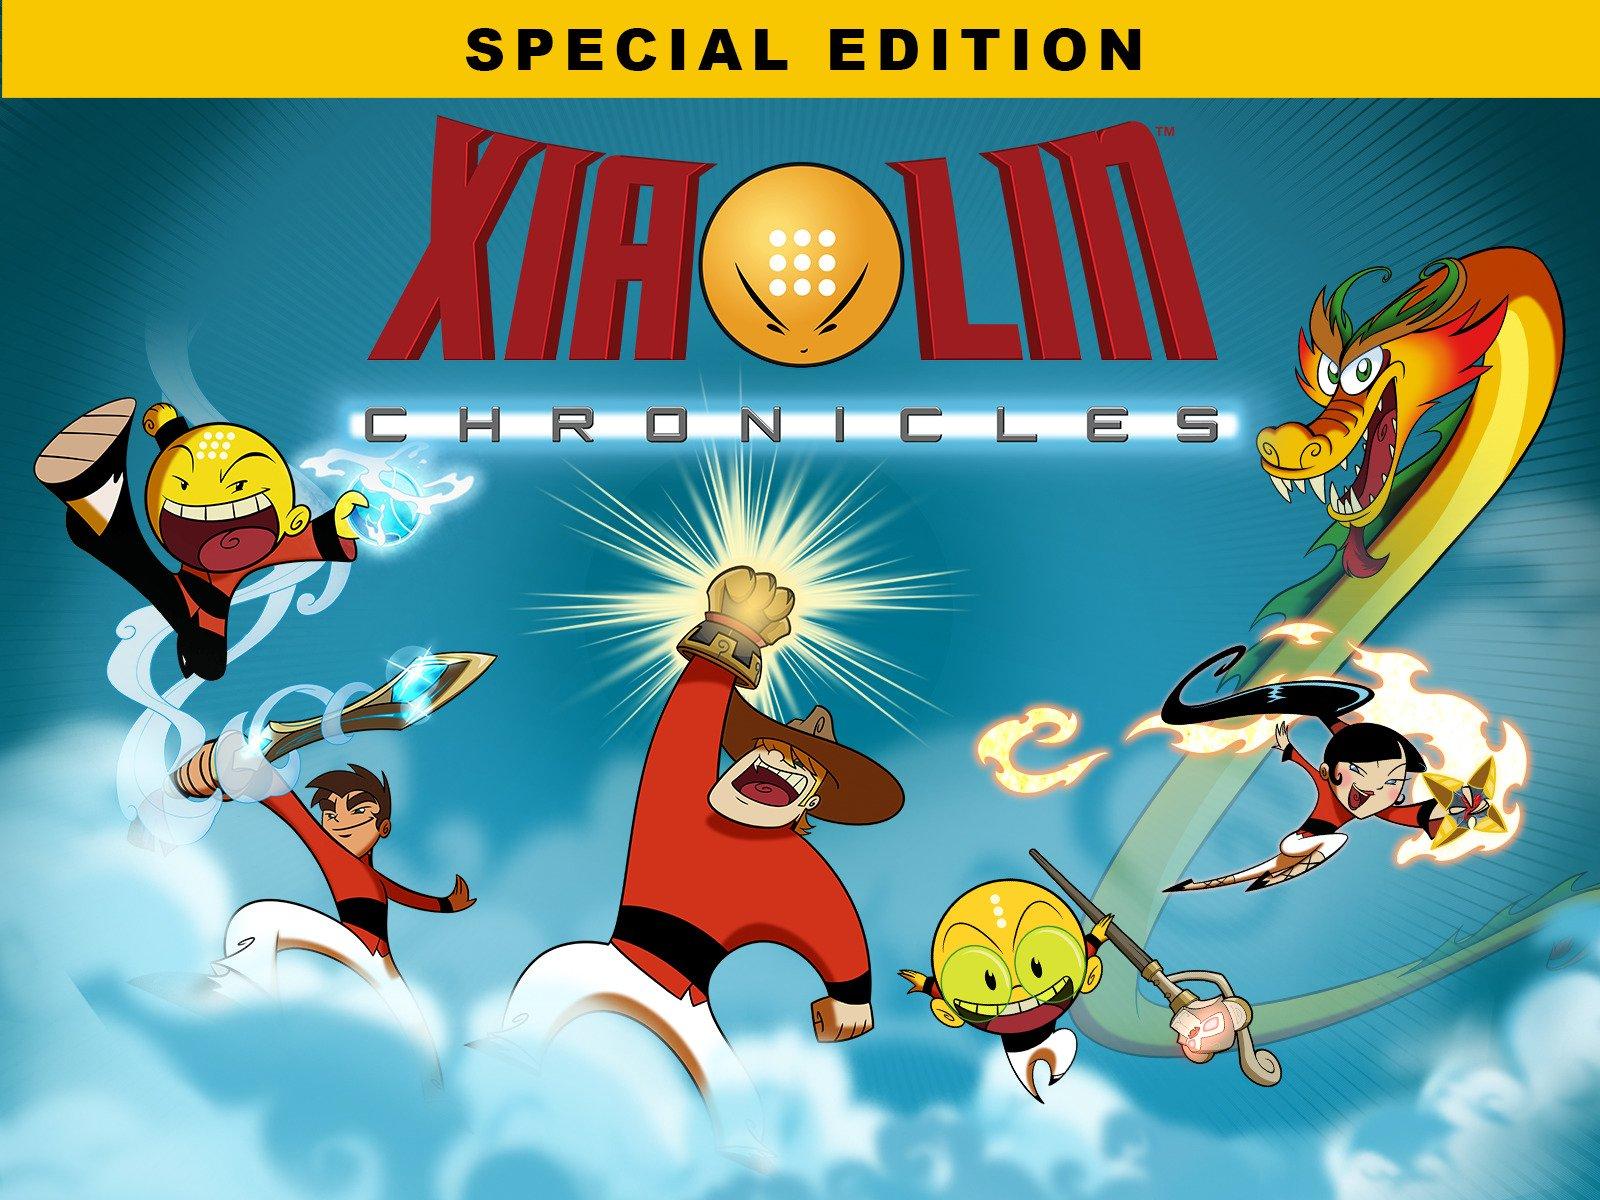 Xiaolin Chronicles: Special Edition - Season 1